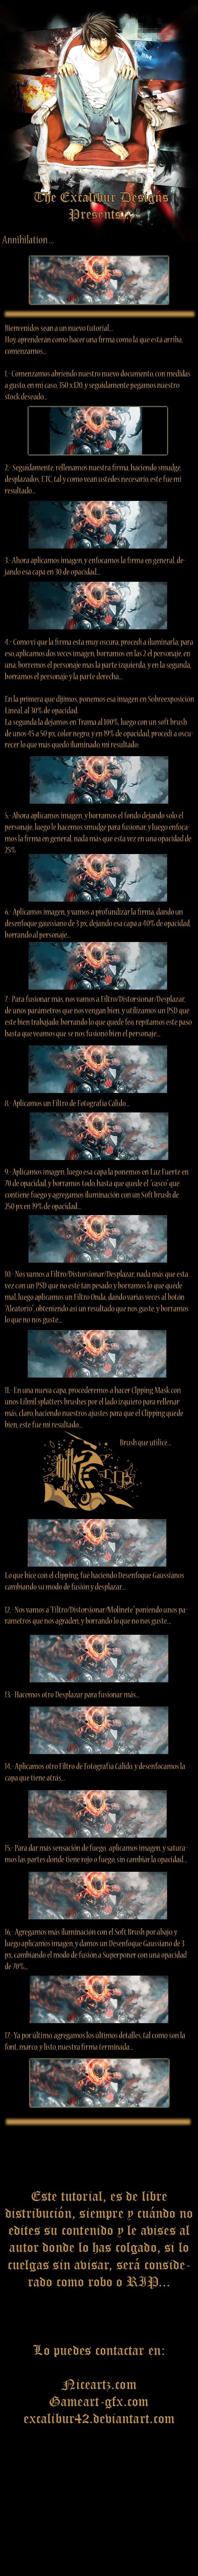 Annihilation Tutorial Annihilation_Tutorial_by_excalibur42